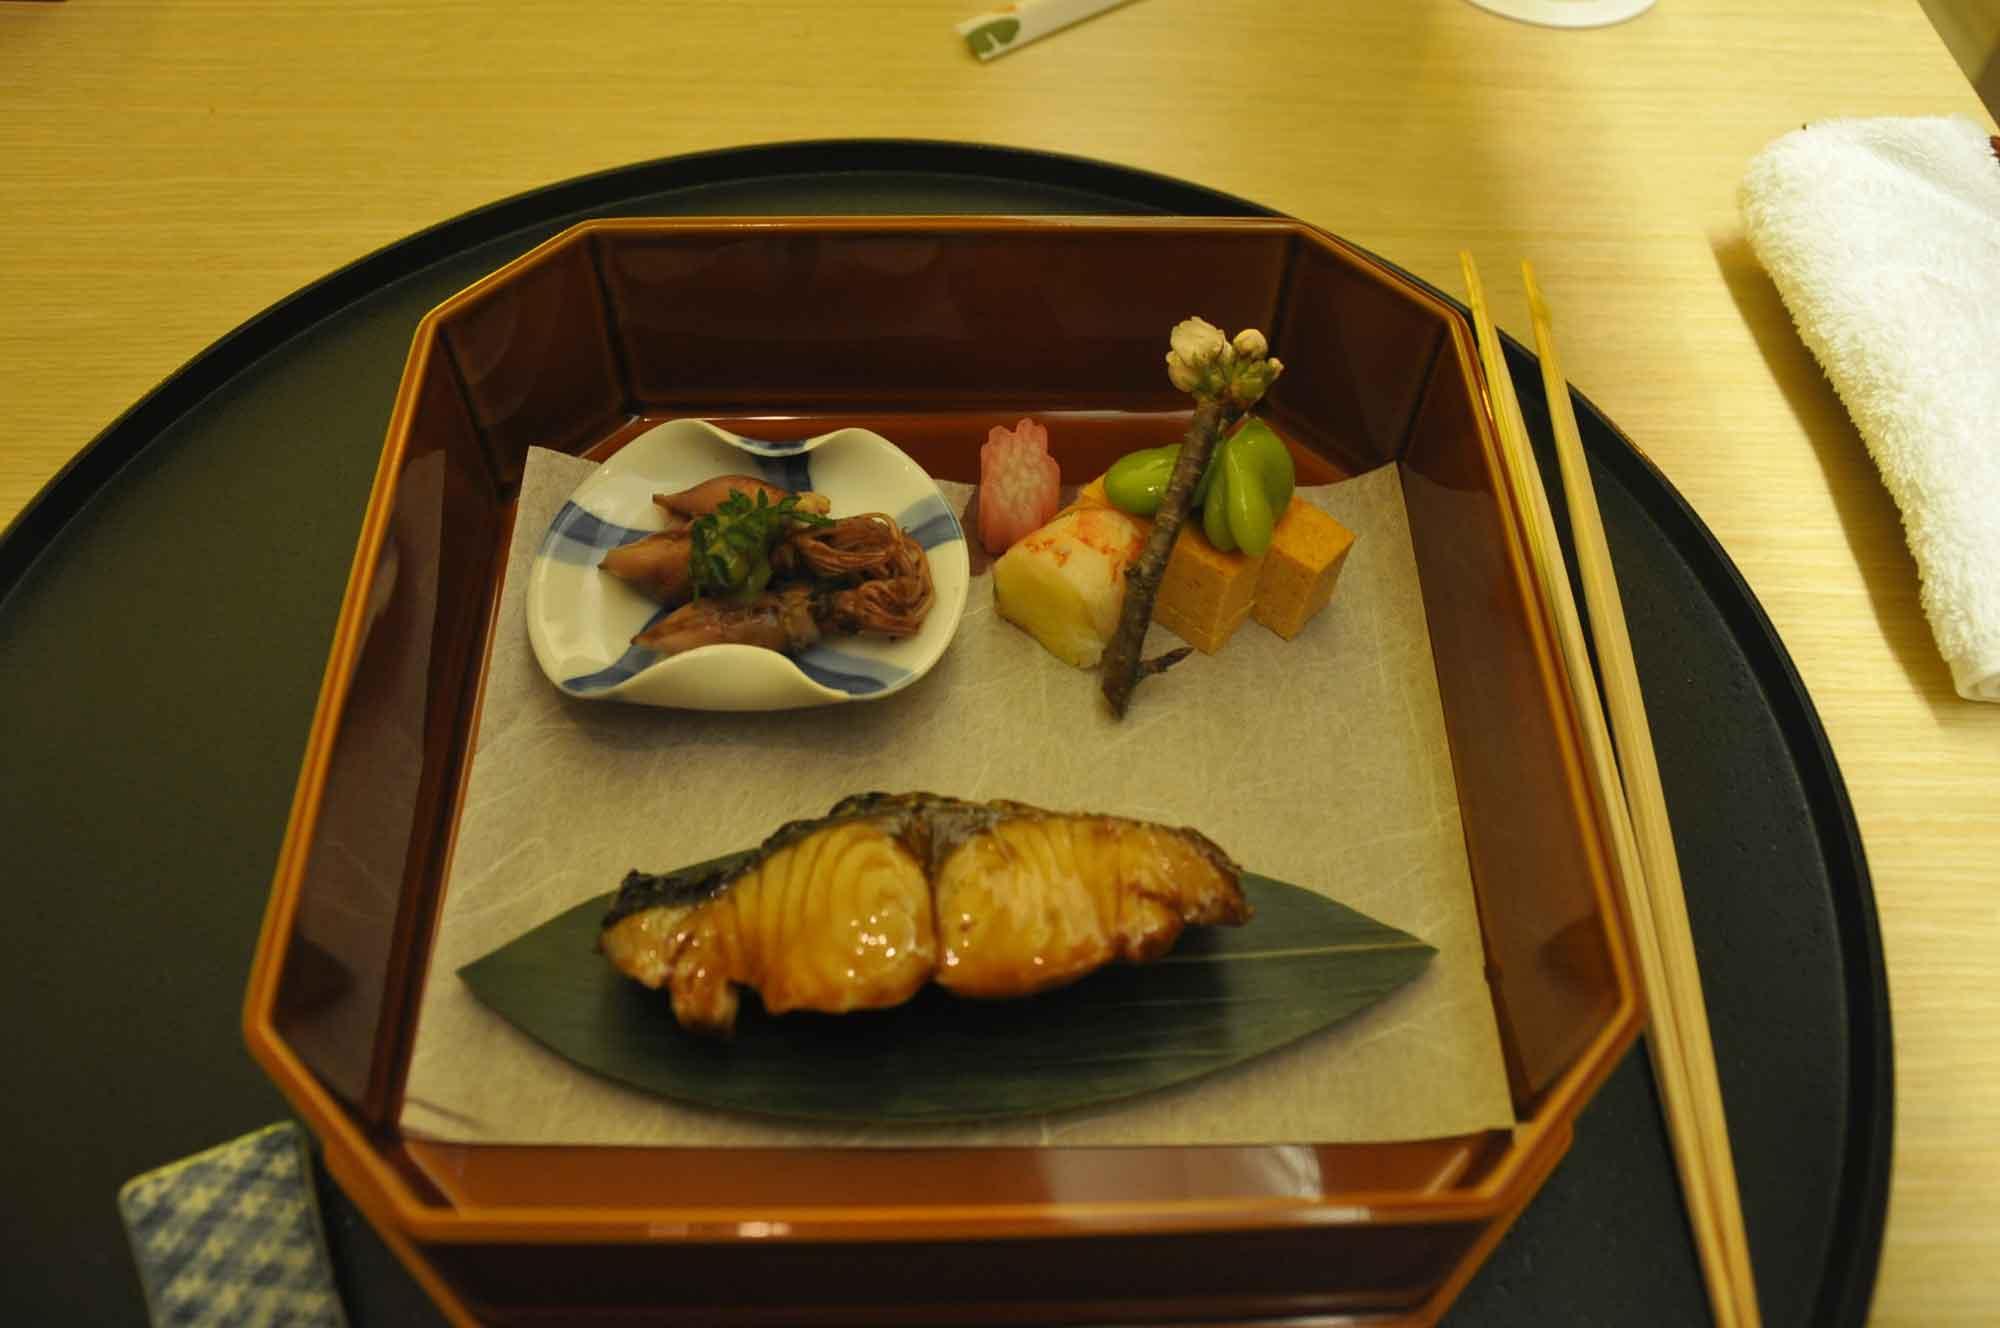 Yamazato Macau Grilled Mackerel